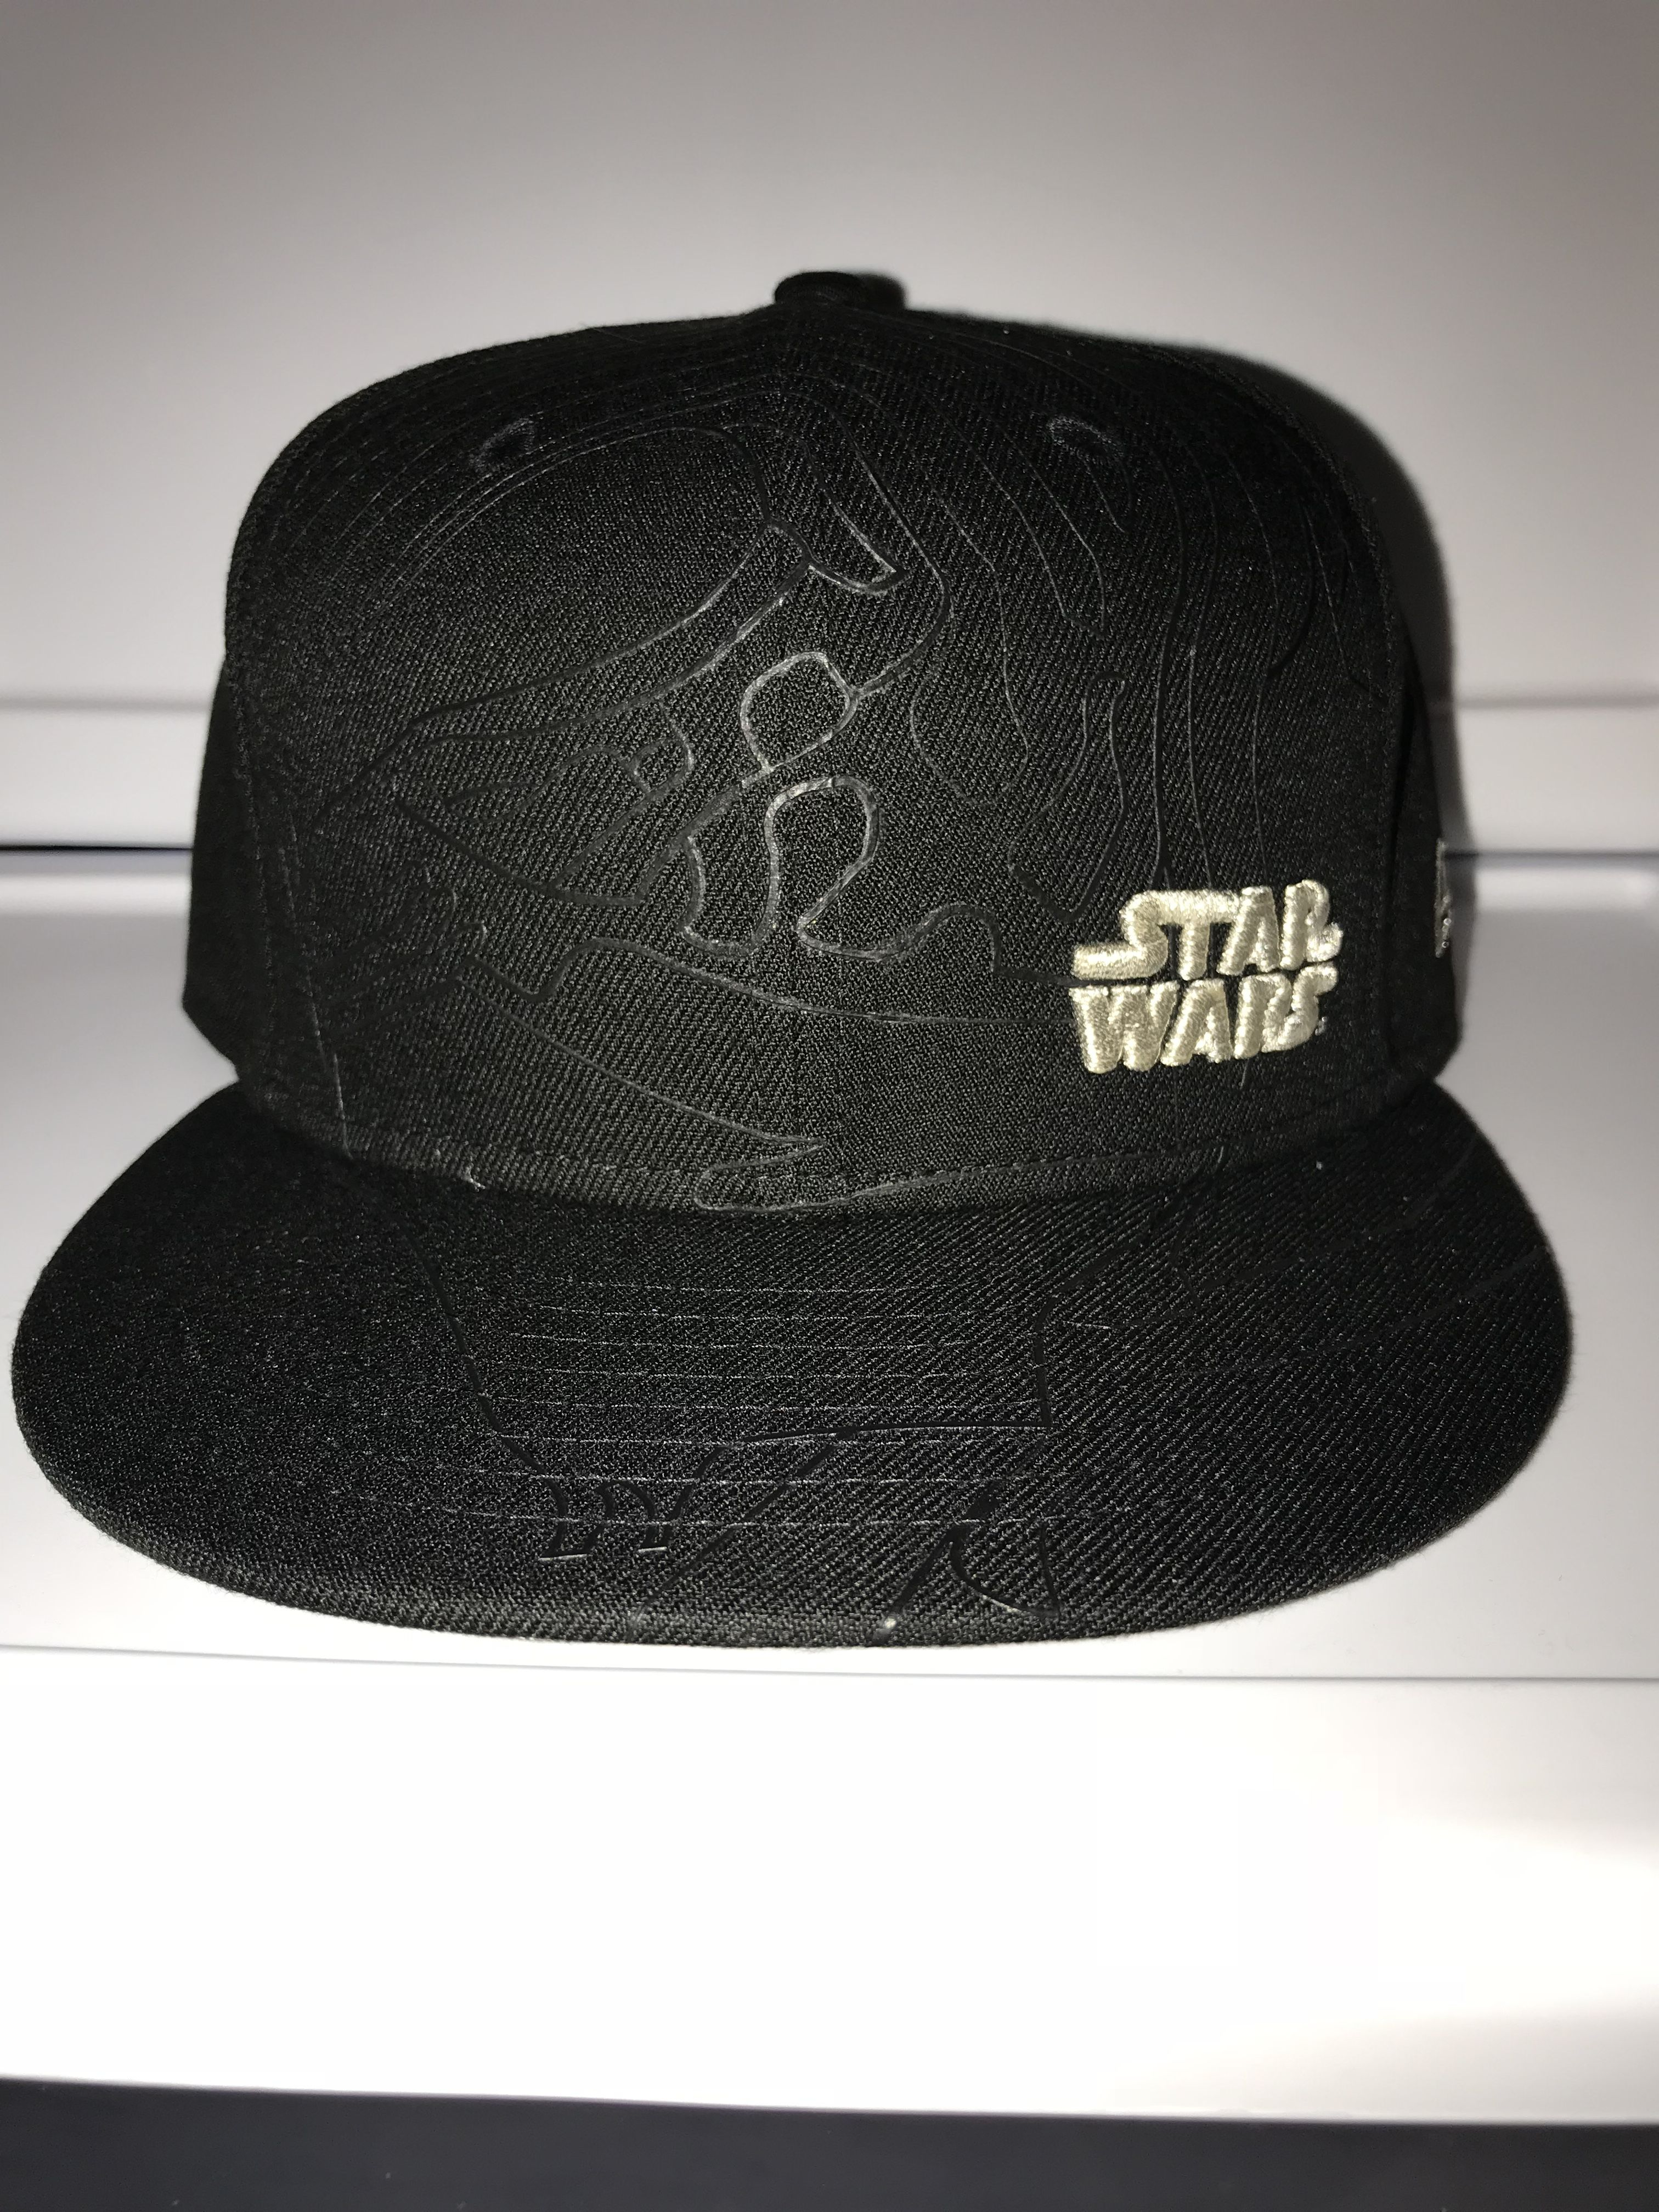 e66b5a17b8e8c New Era Star Wars the last Jedi Kylo ren profile outline 9FIFTY snapback